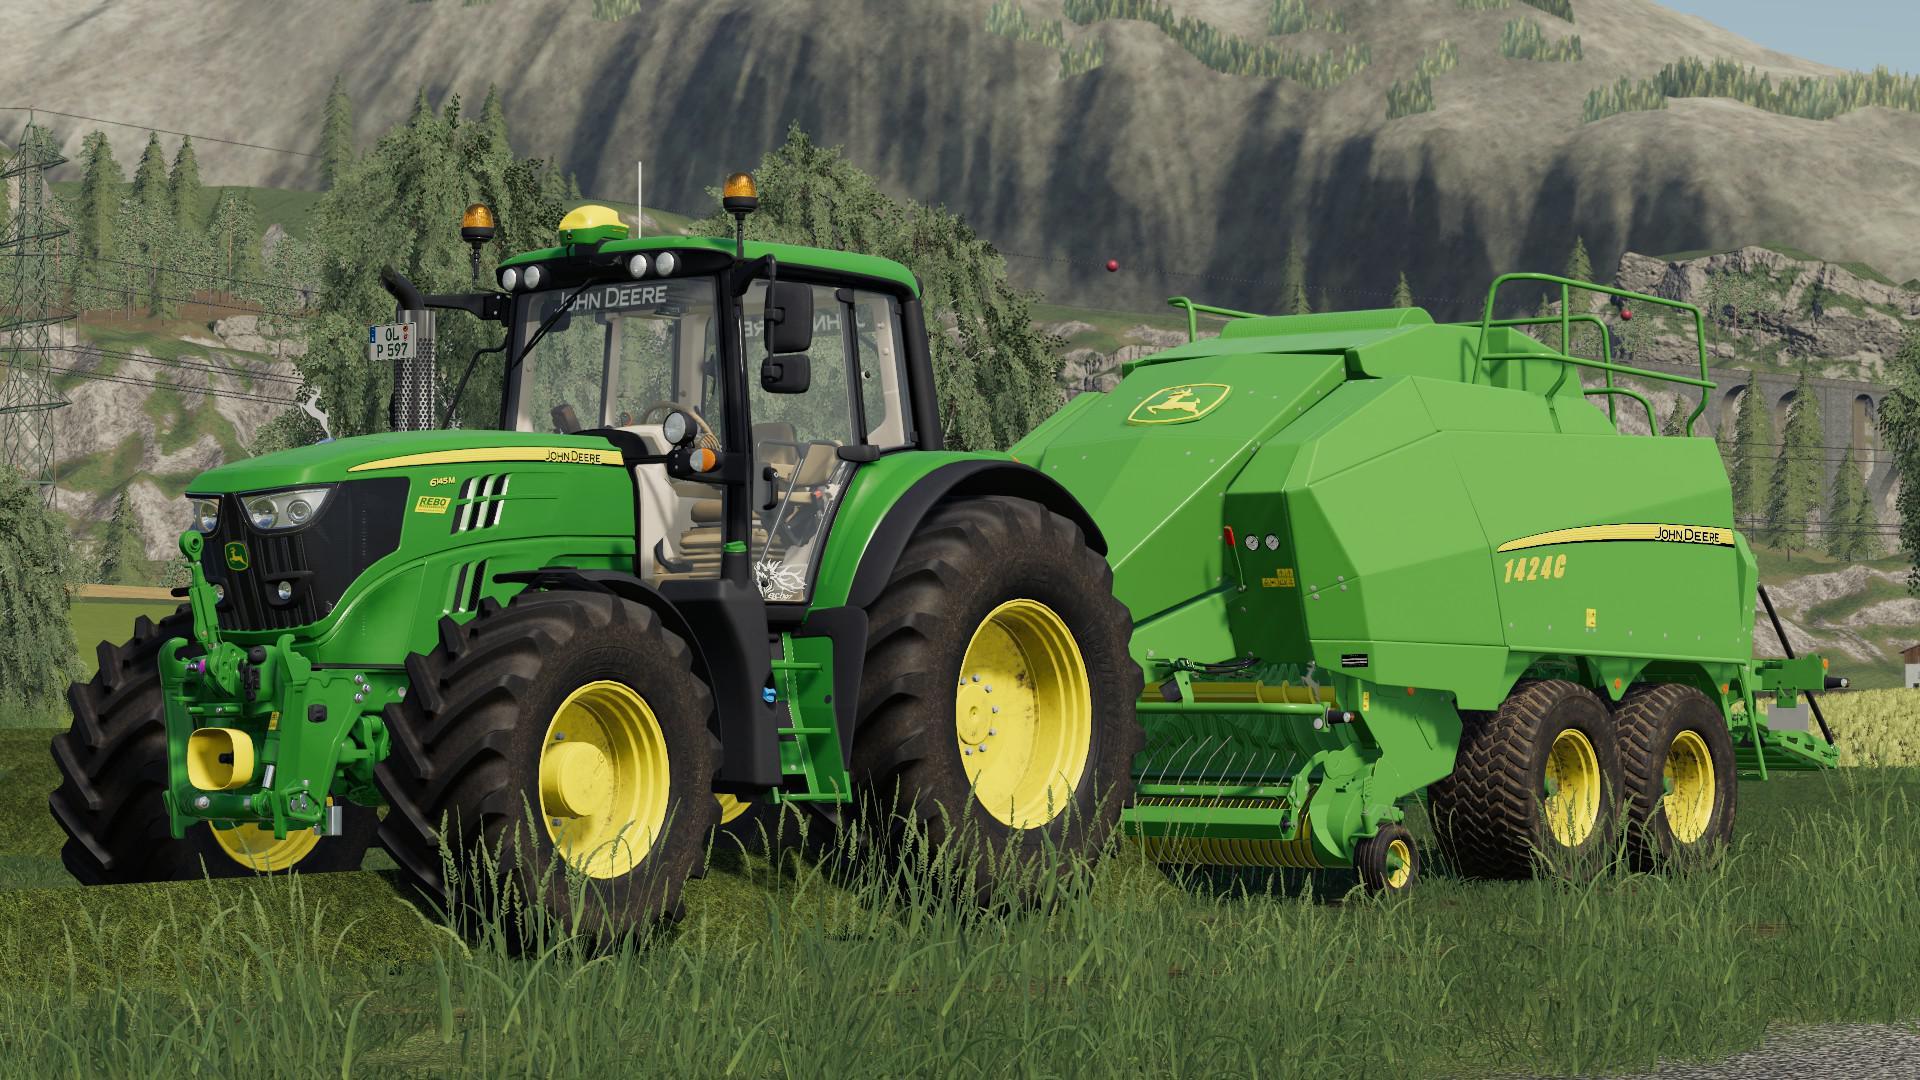 JOHN DEERE 1424C V1.0.0.0 для Farming Simulator 2019